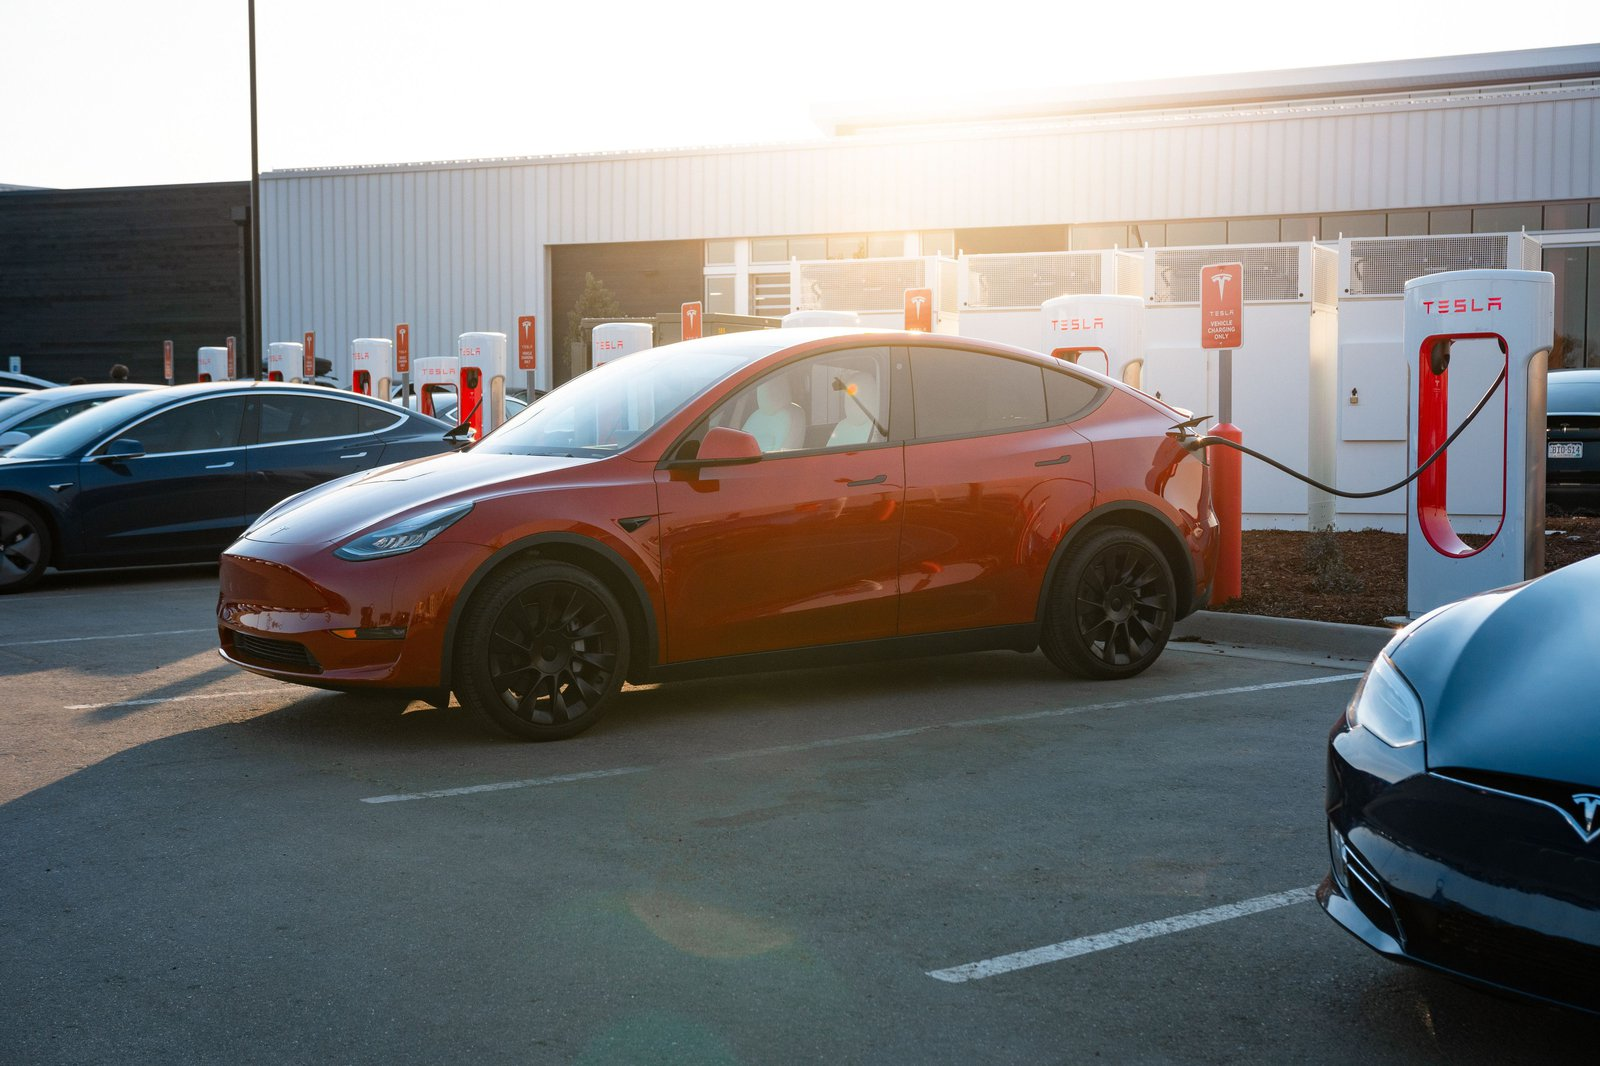 Telsa electric cars